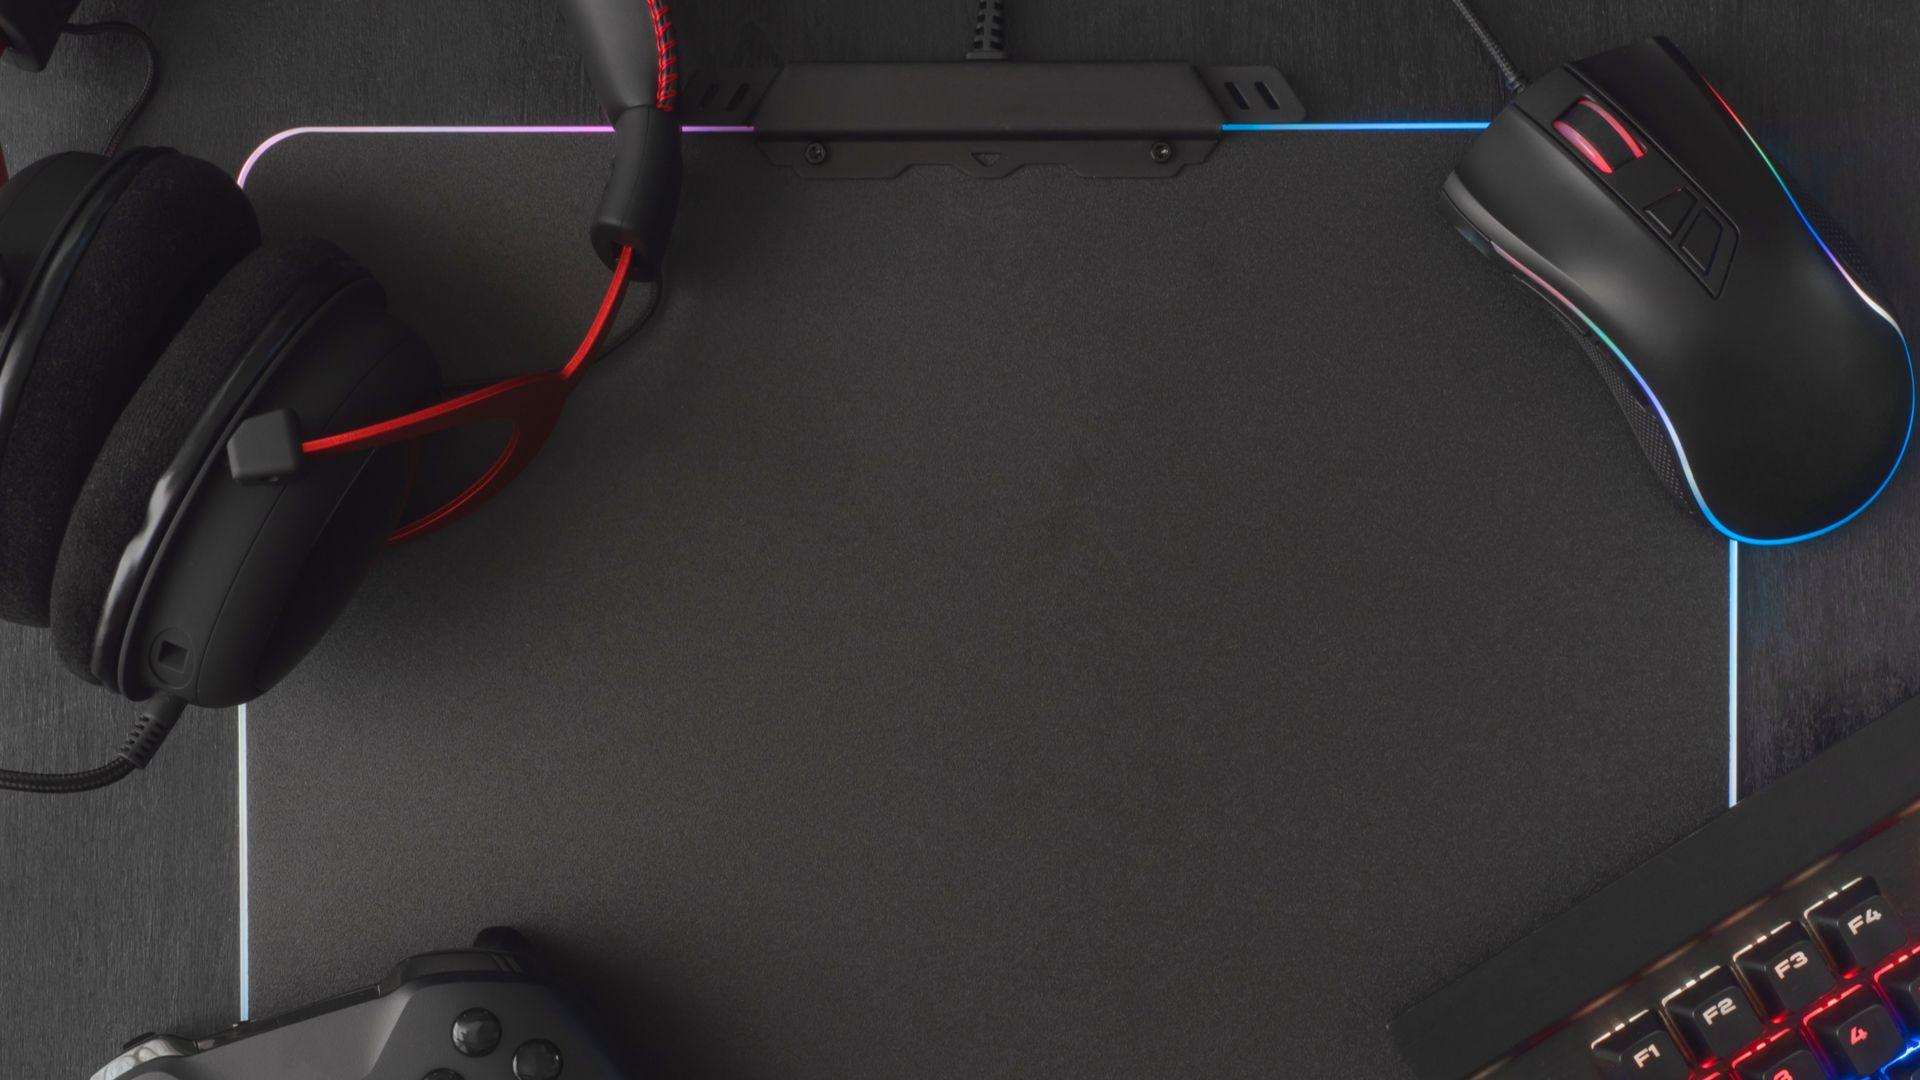 "Mouse pads gamer podem ter até iluminação RGB. (Foto: Reprodução/Shutterstock/<a href=""https://www.shutterstock.com/pt/g/EKKAPHAN%2BCHIMPALEE"">EKKAPHAN CHIMPALEE</a>)"